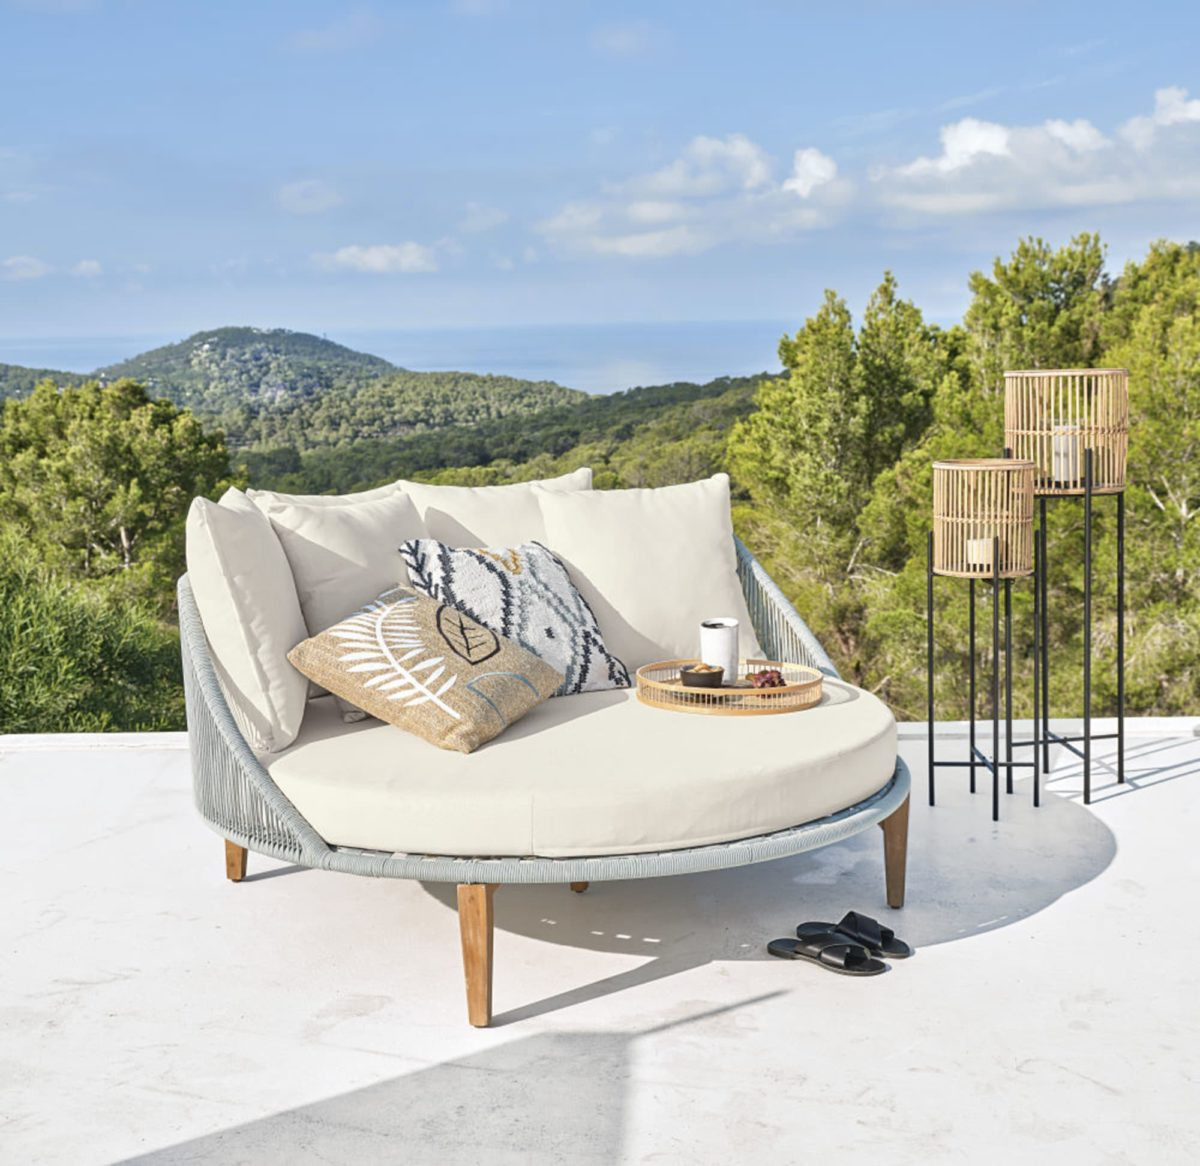 maisons-du-monde-catalogo-giardino-2020-lettino-prendisole